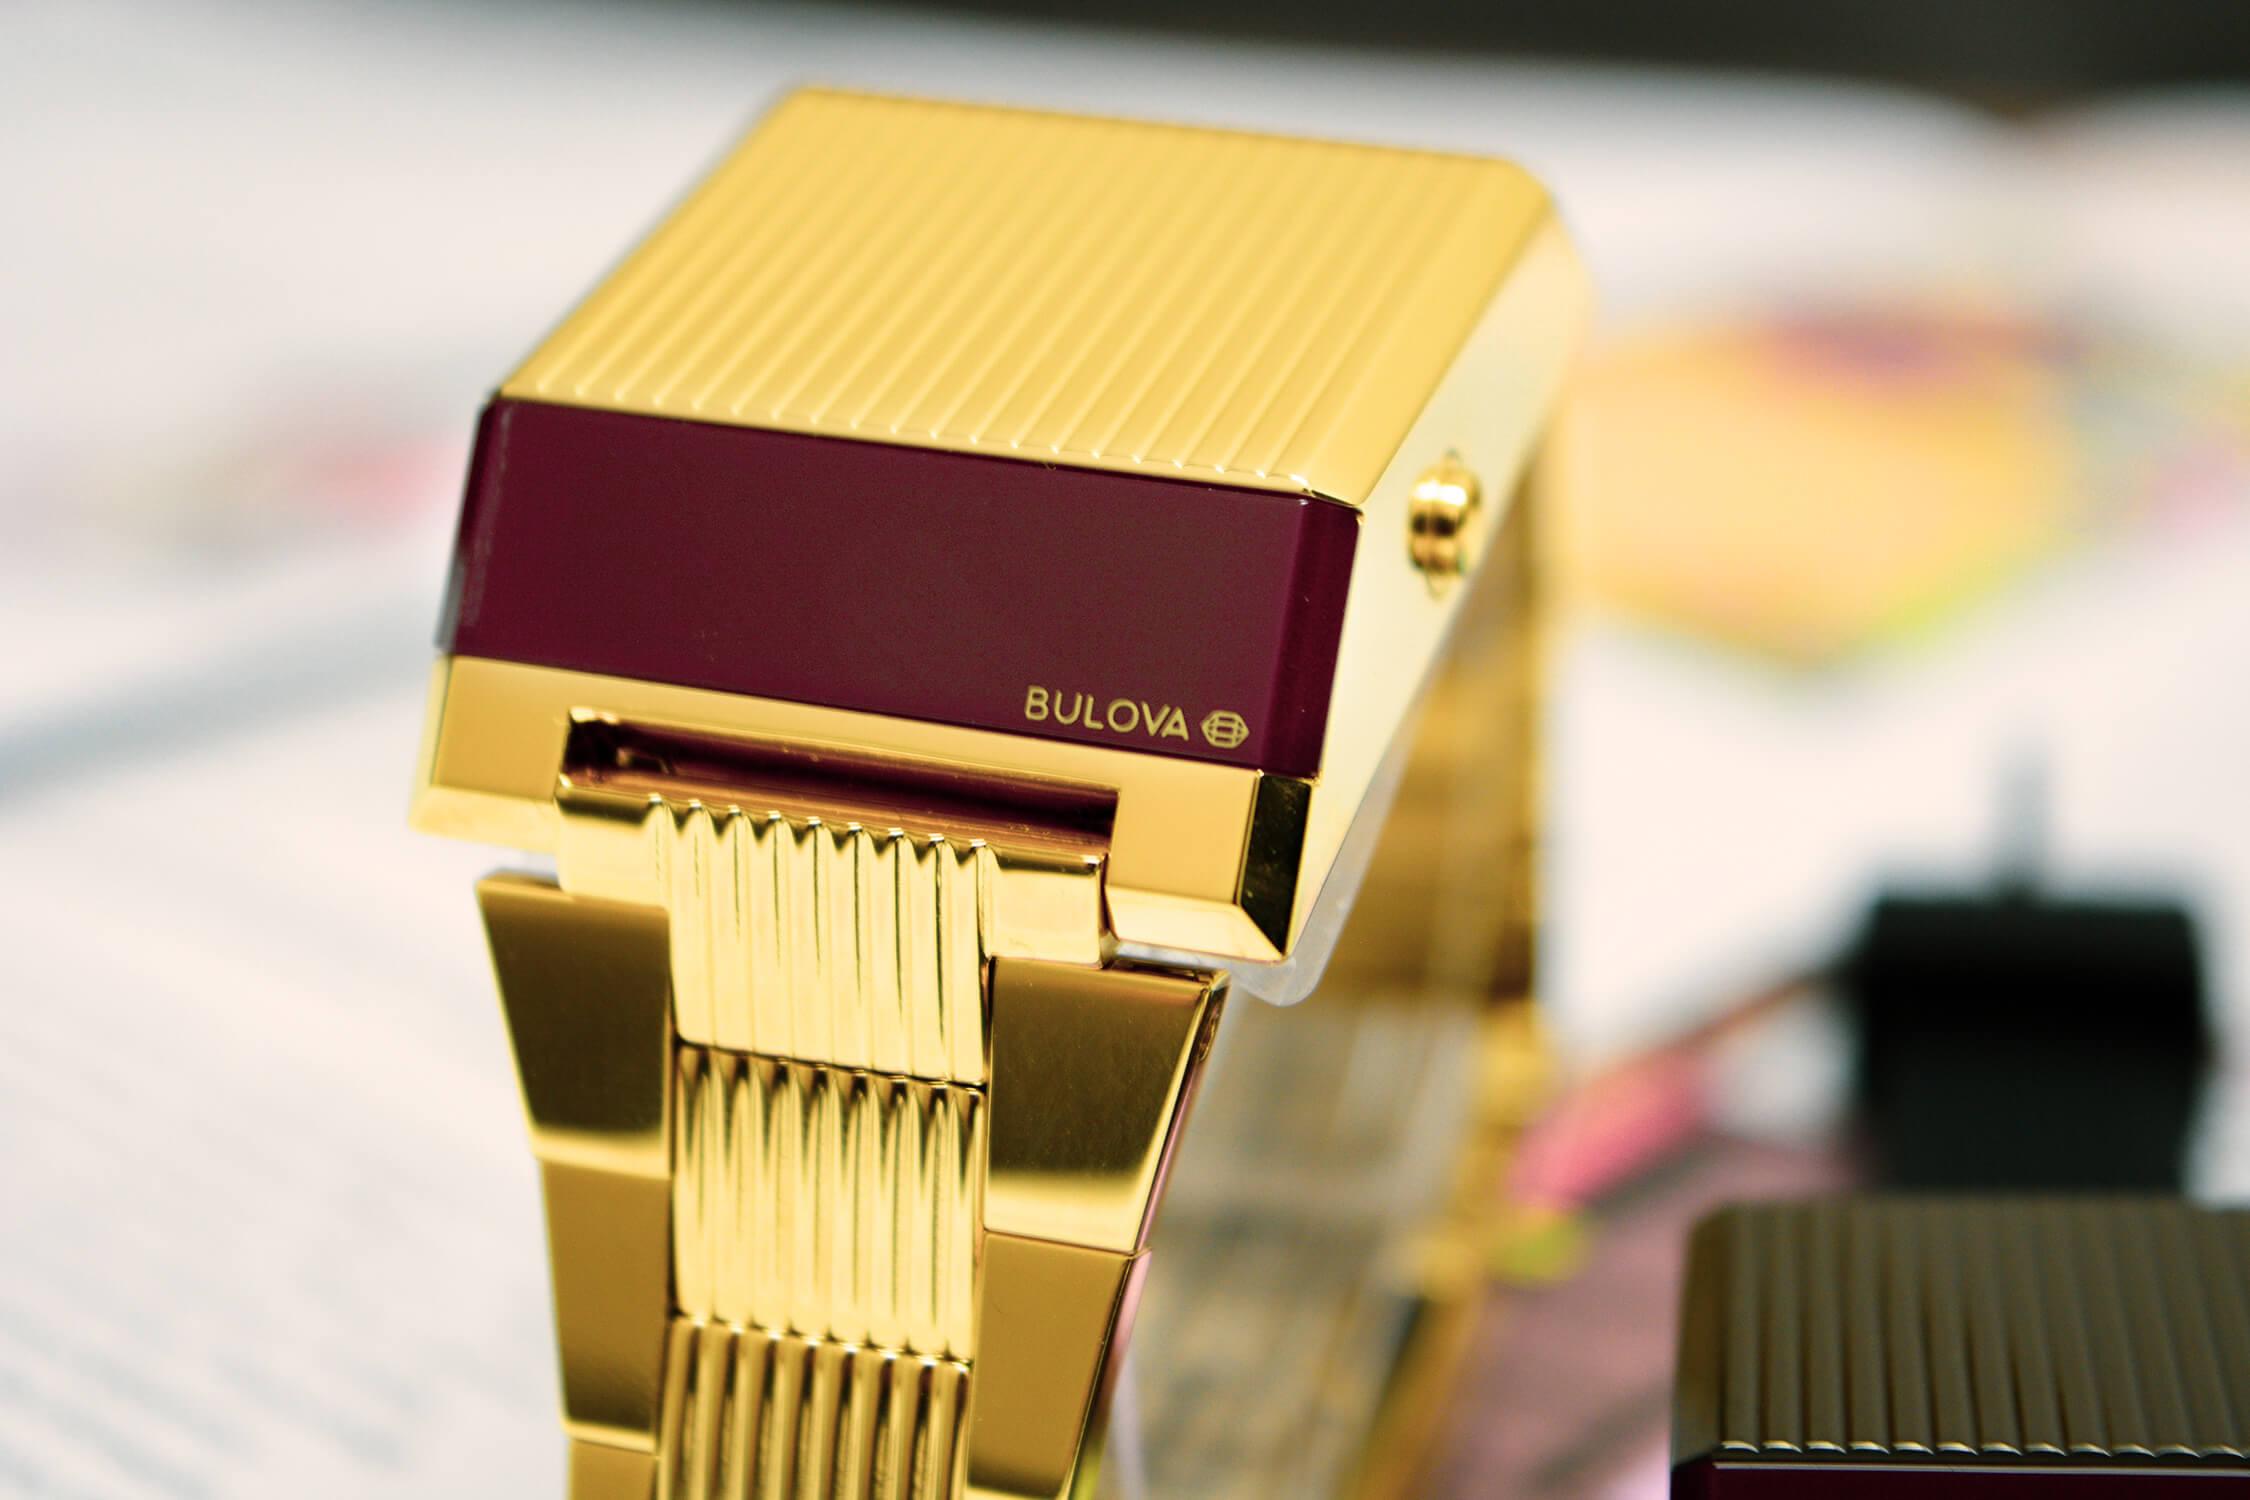 часы bulova computron 97C110